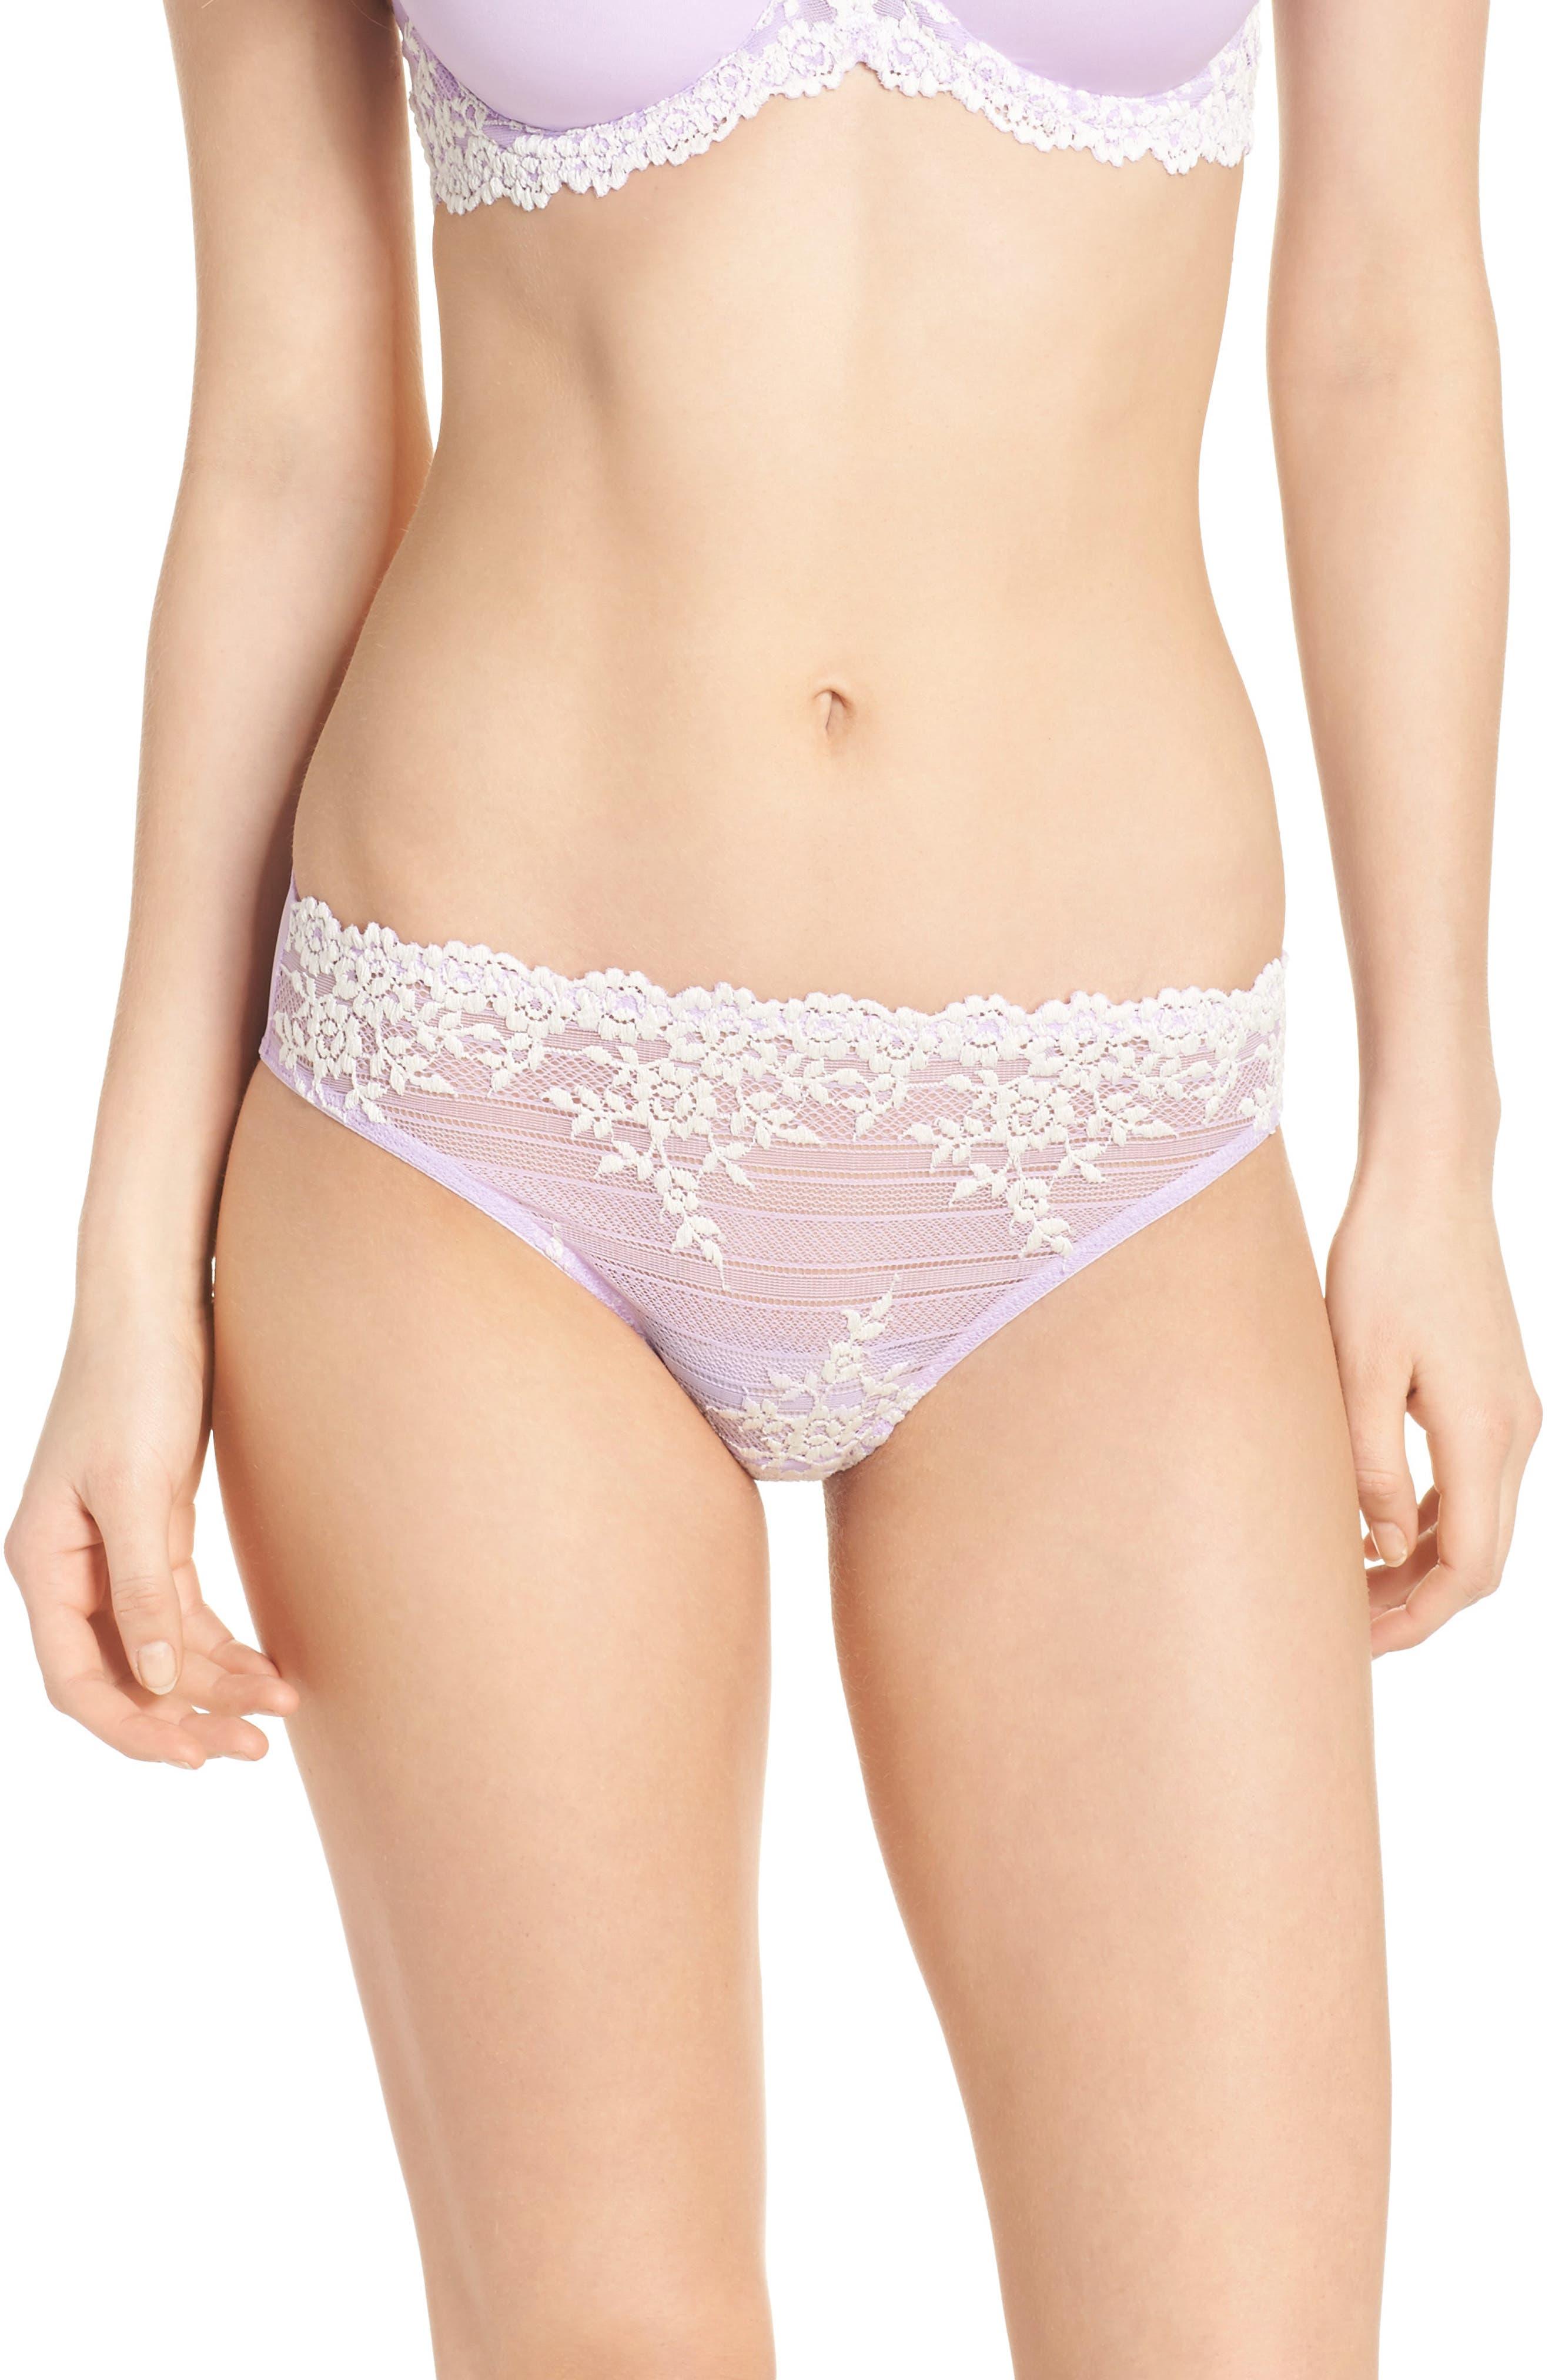 'Embrace' Lace Bikini,                         Main,                         color, Lavender